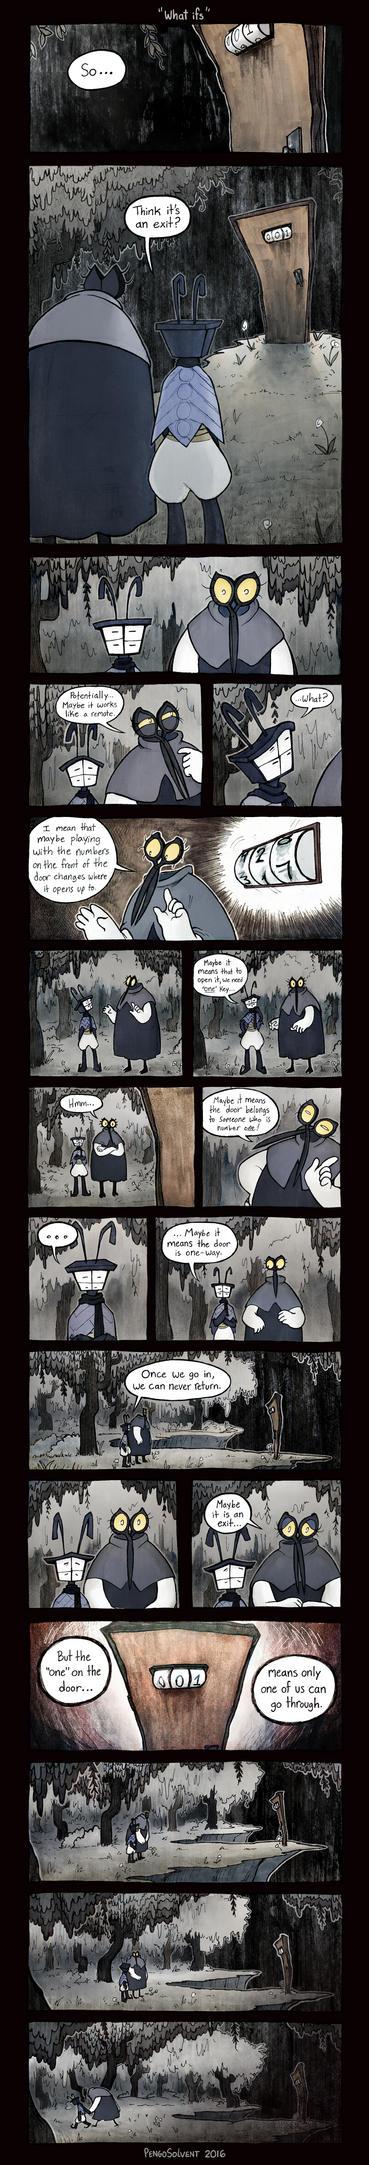 ObjectHead Zine Comic by pengosolvent